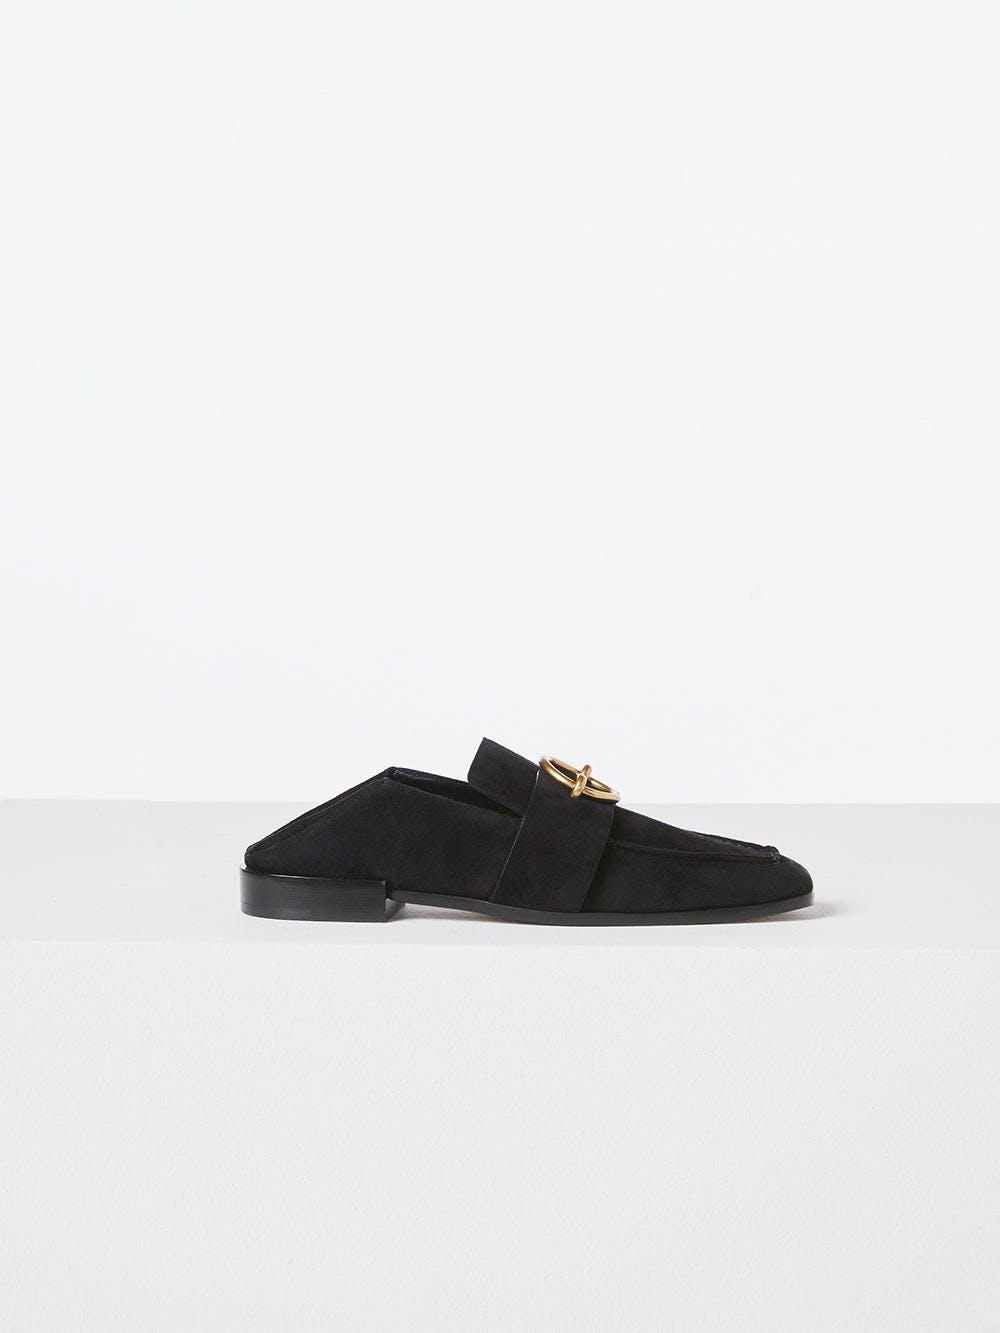 shoe side view 2